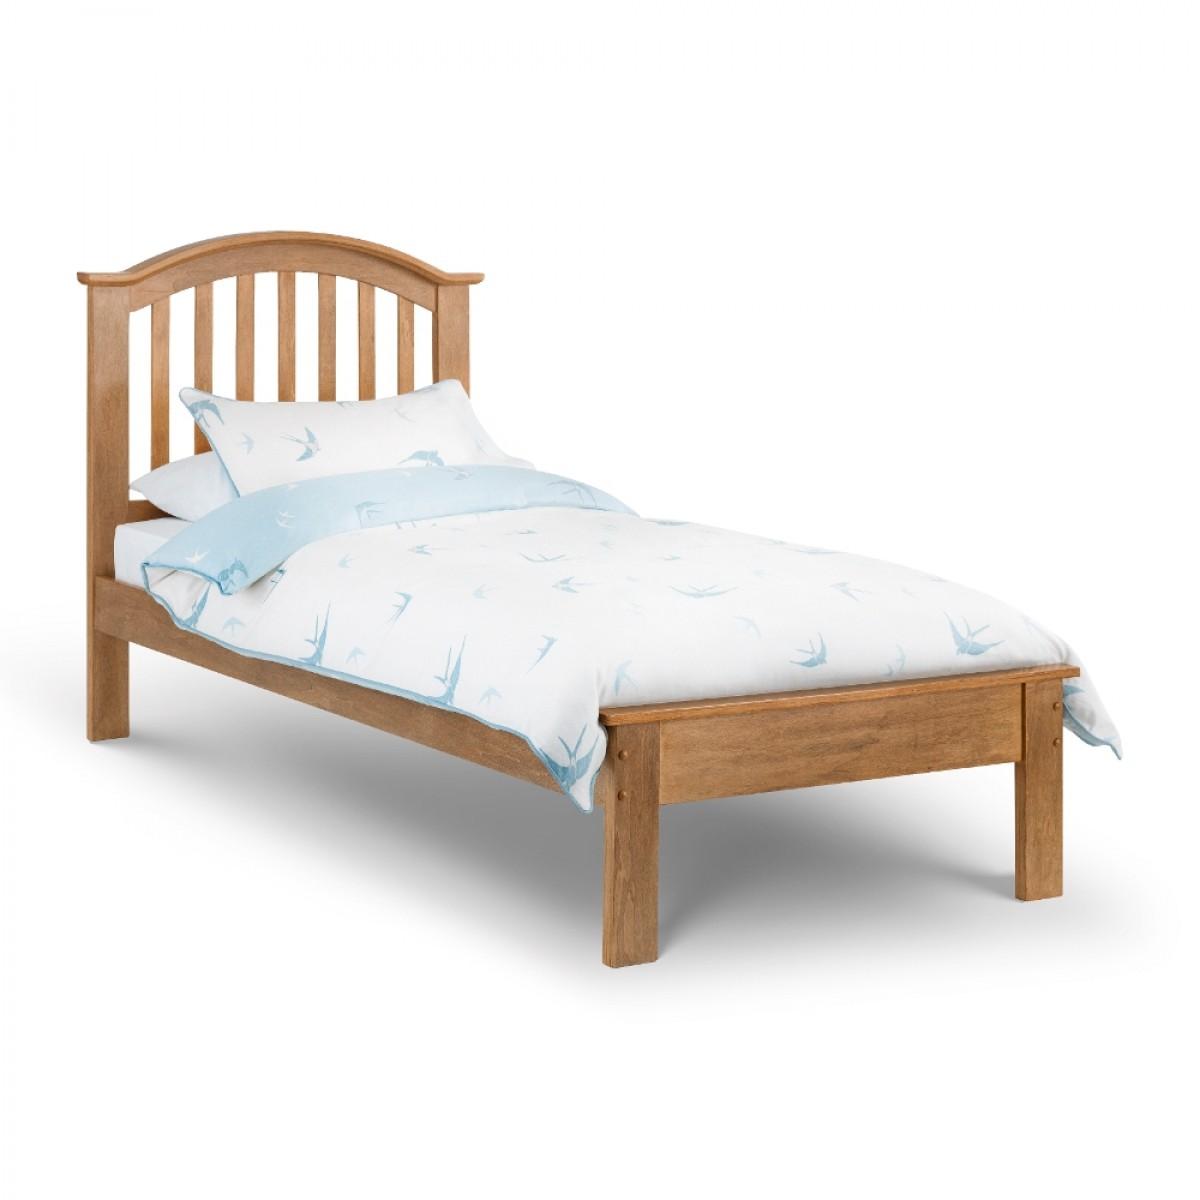 Olivia Oak Finish Wooden Bed